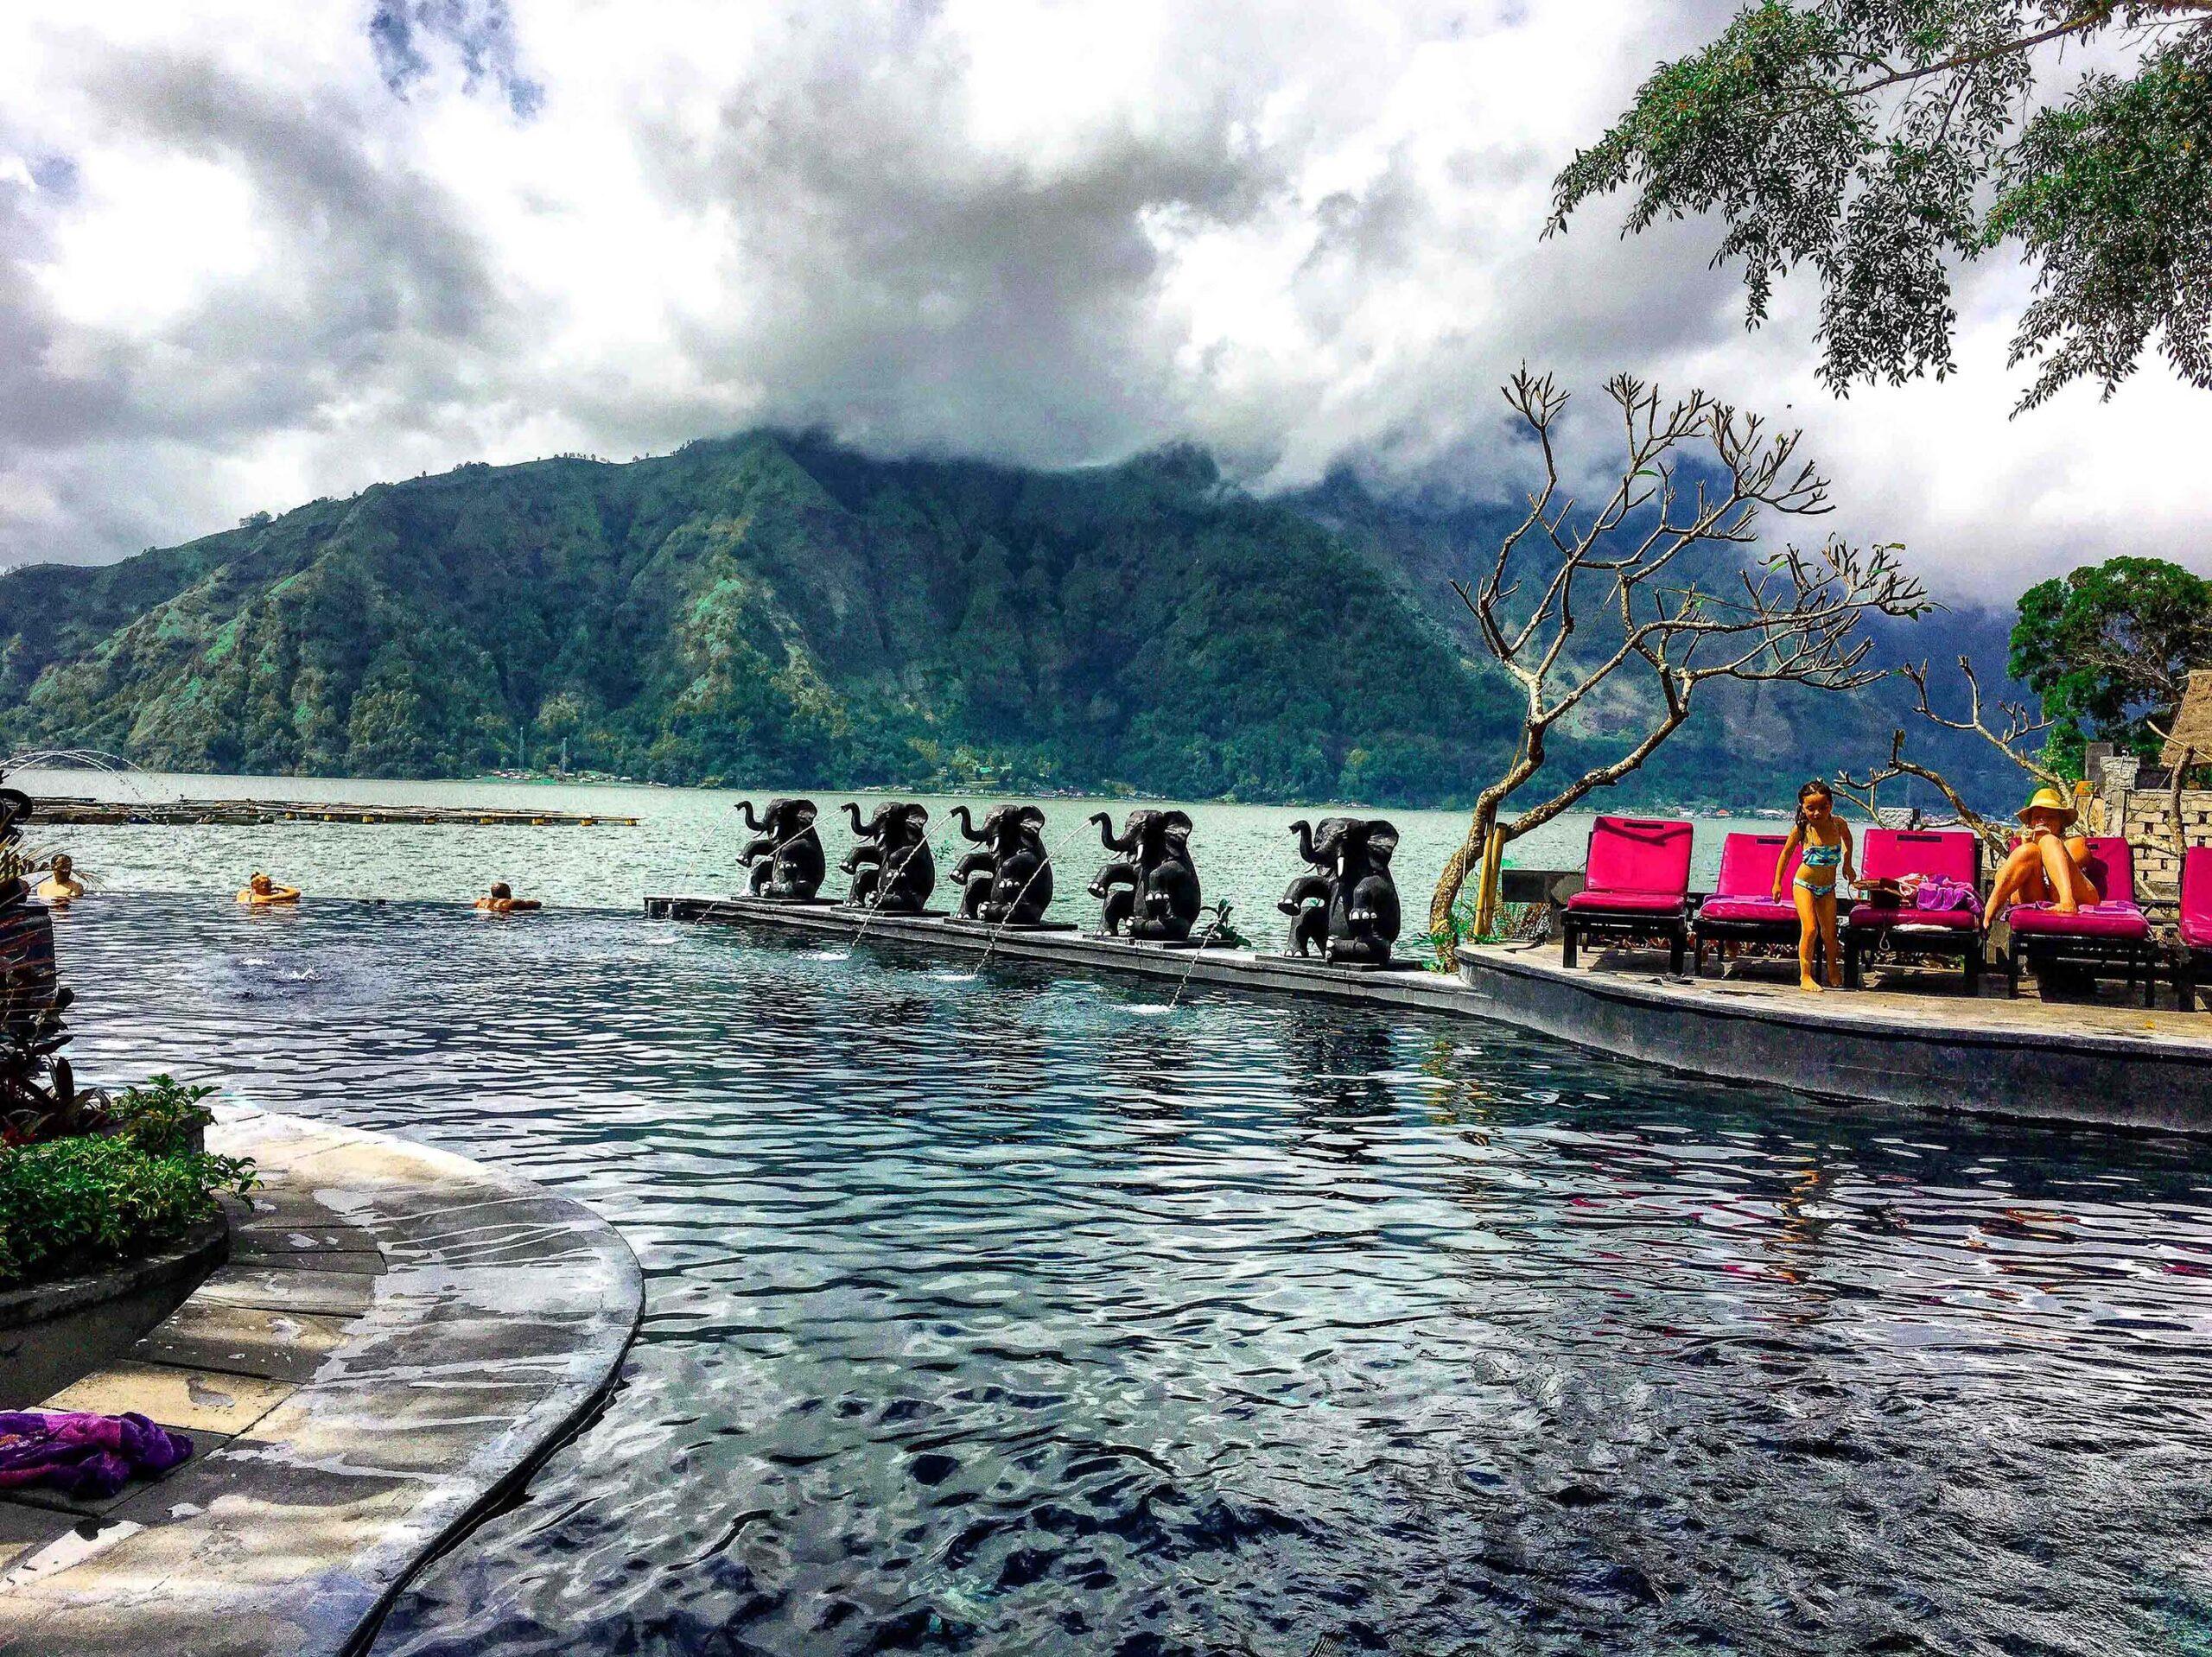 Фото источников возле озера и вулкана Батур